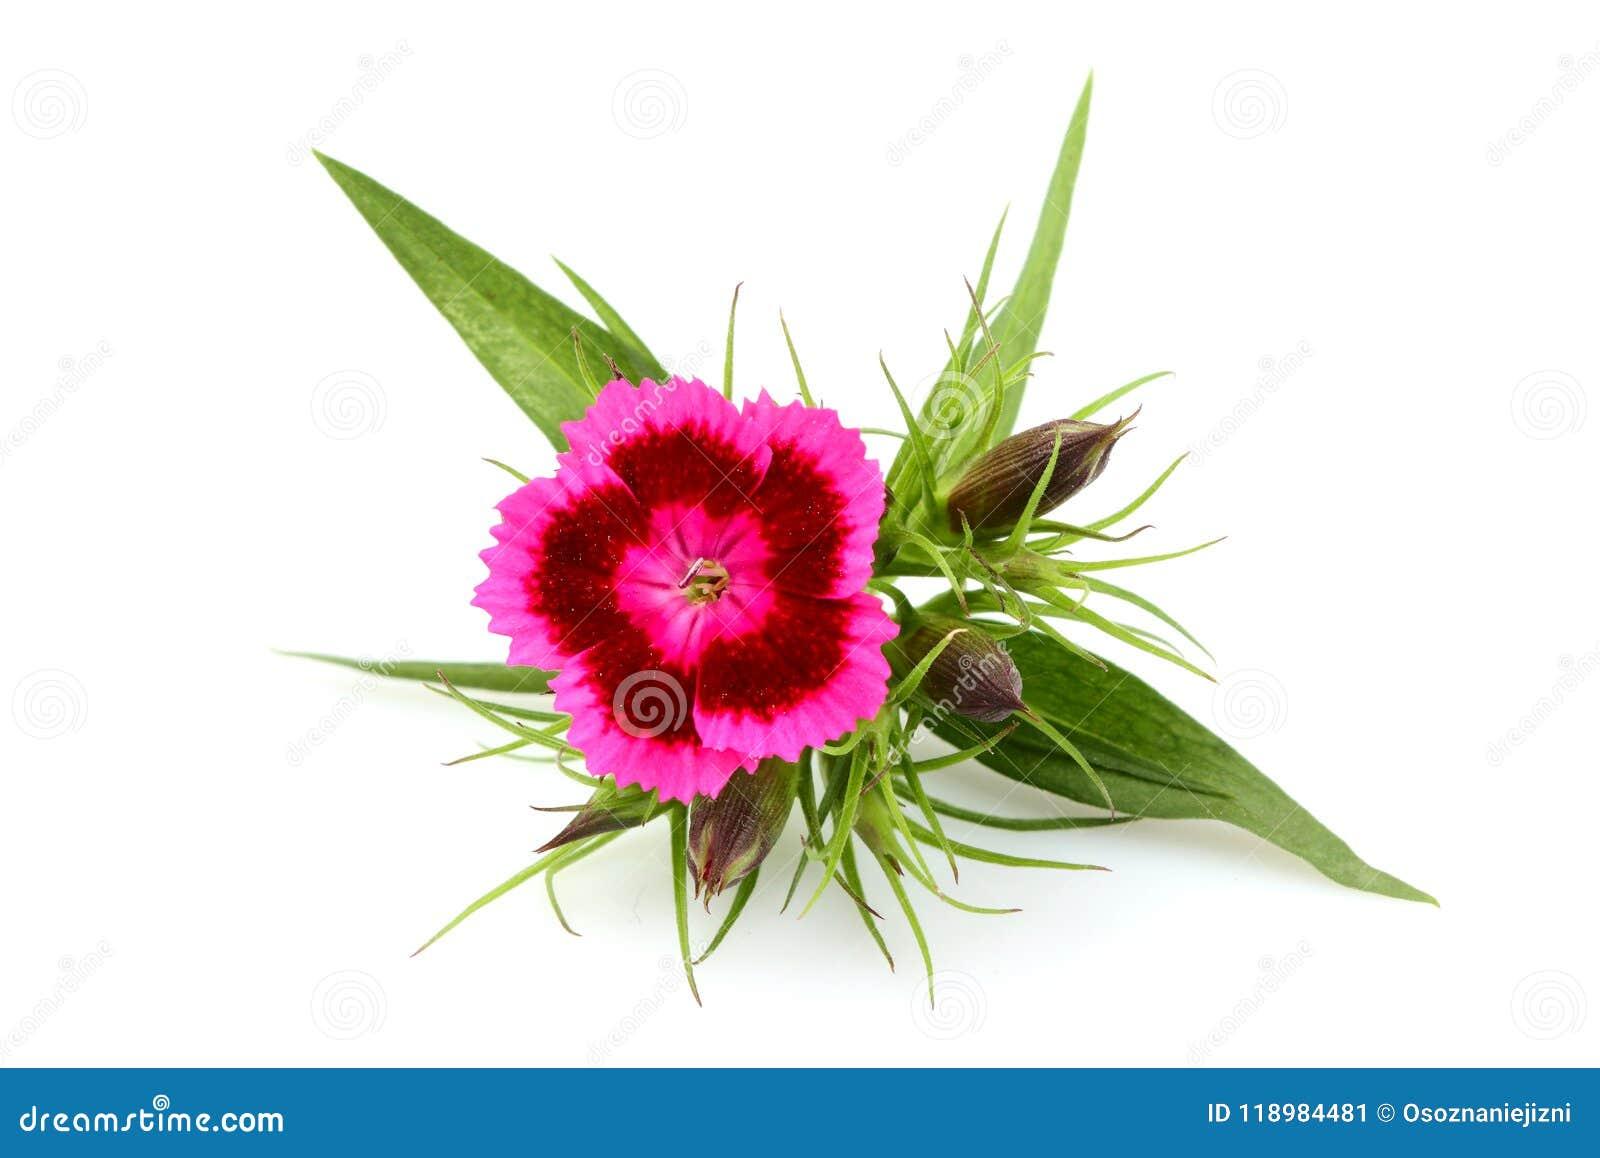 Dianthus Barbatus Sweet William Flower Isolated Stock Image